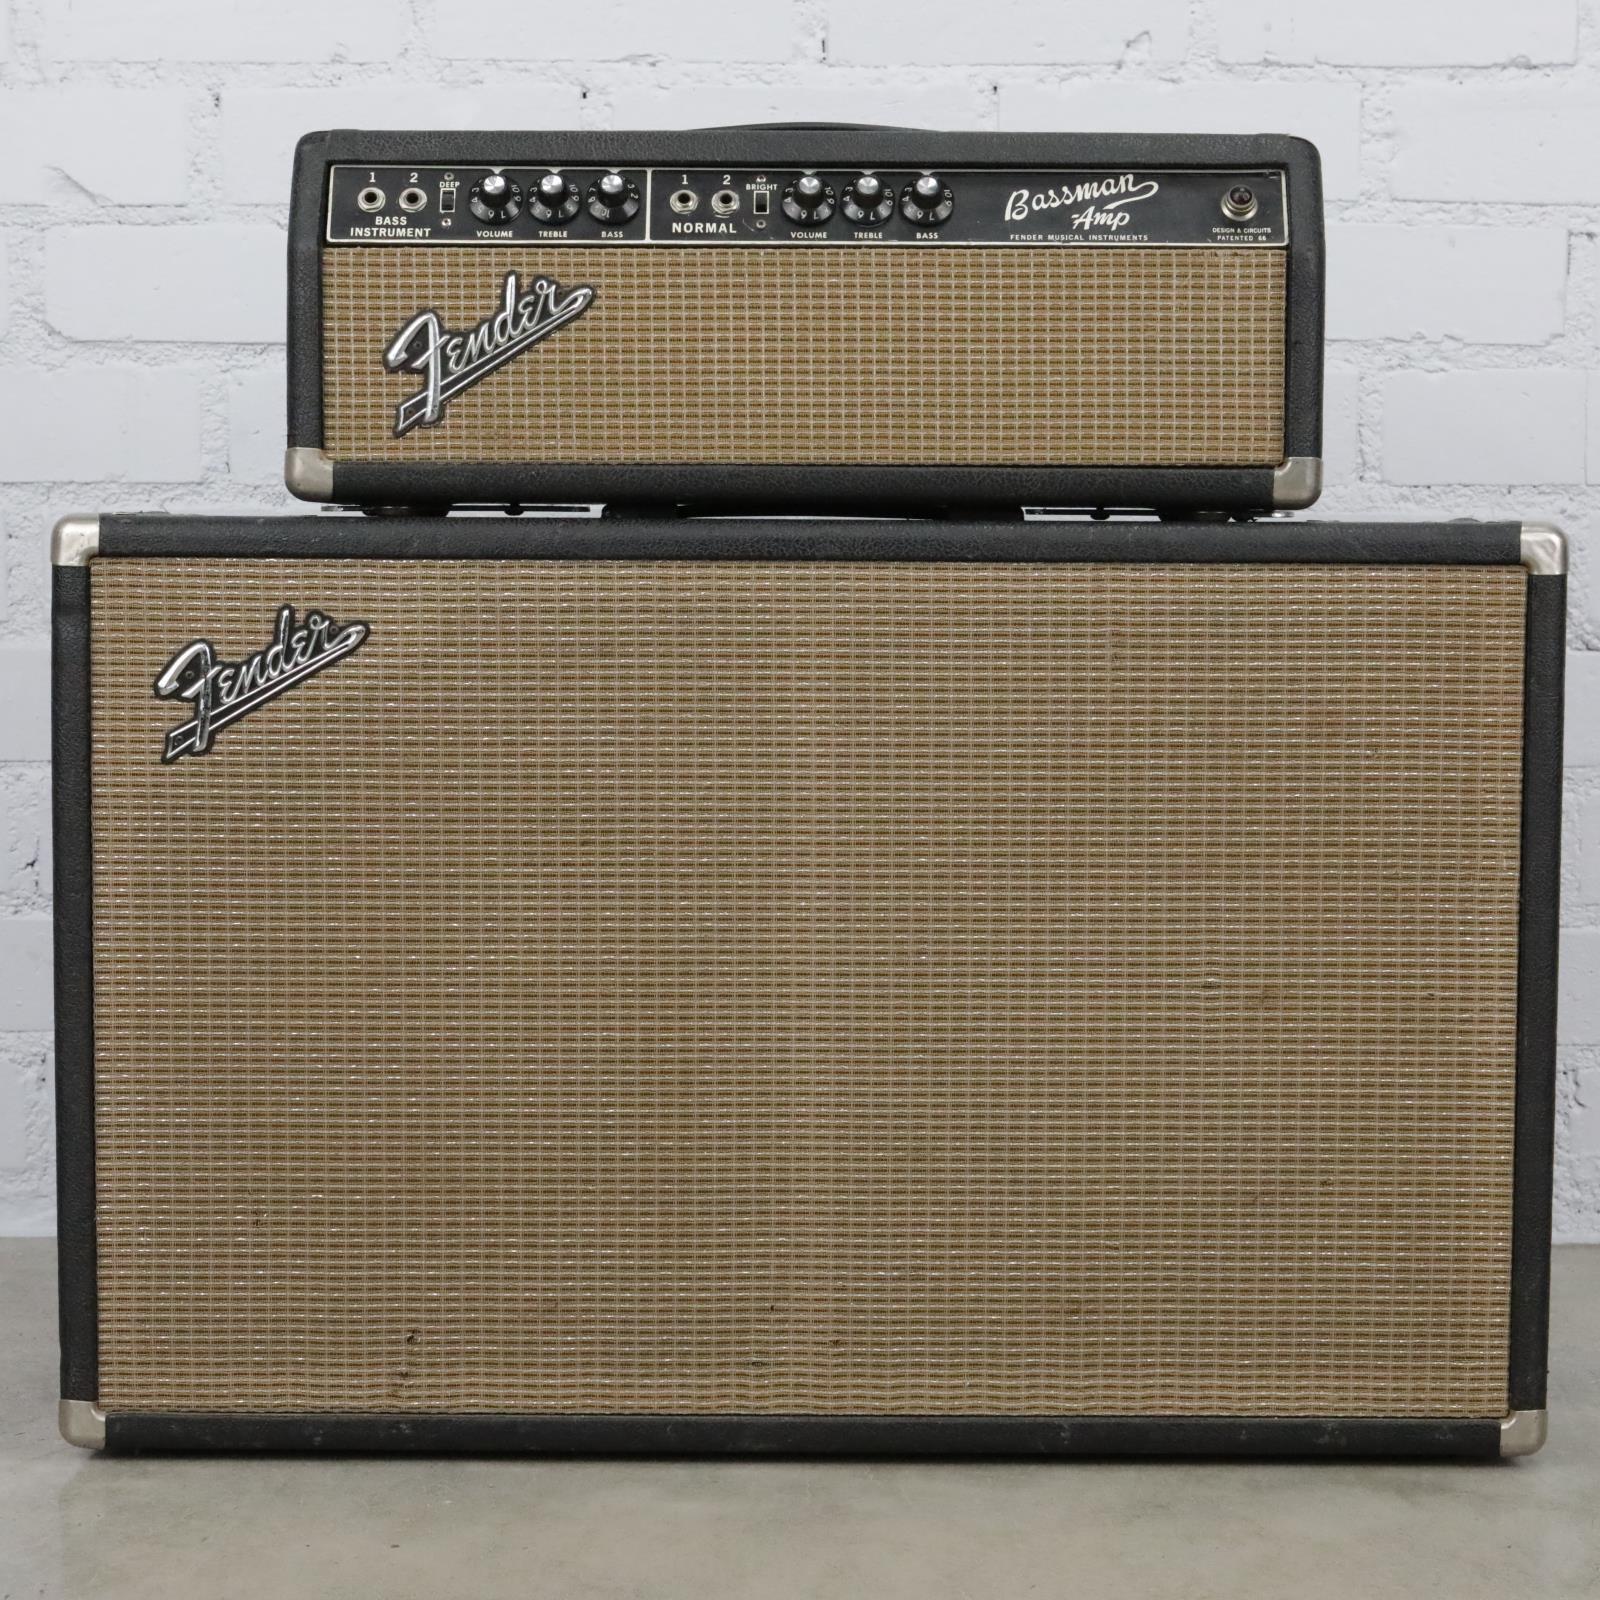 1967 Fender Bassman Tube Amp Head & 2x12 Piggyback Cabinet Jensen #40470